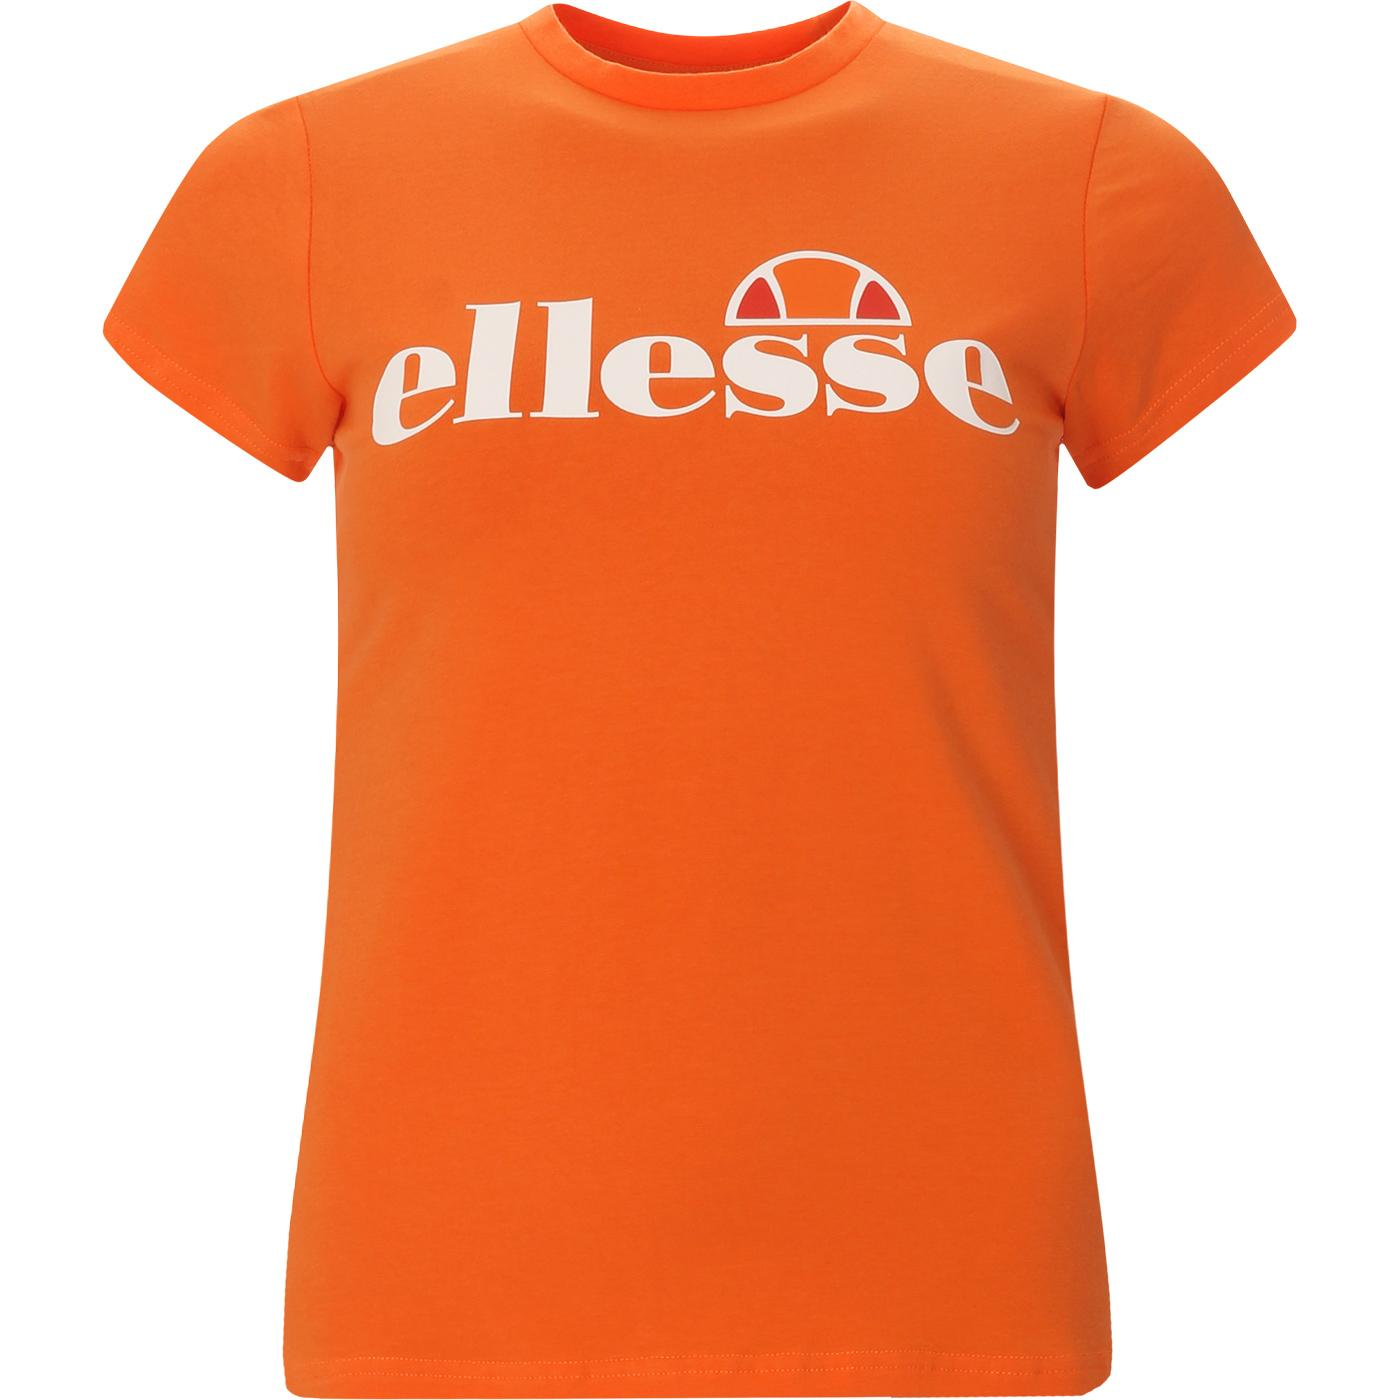 Hayes ELLESSE Women's Retro Logo Tee (Orange)